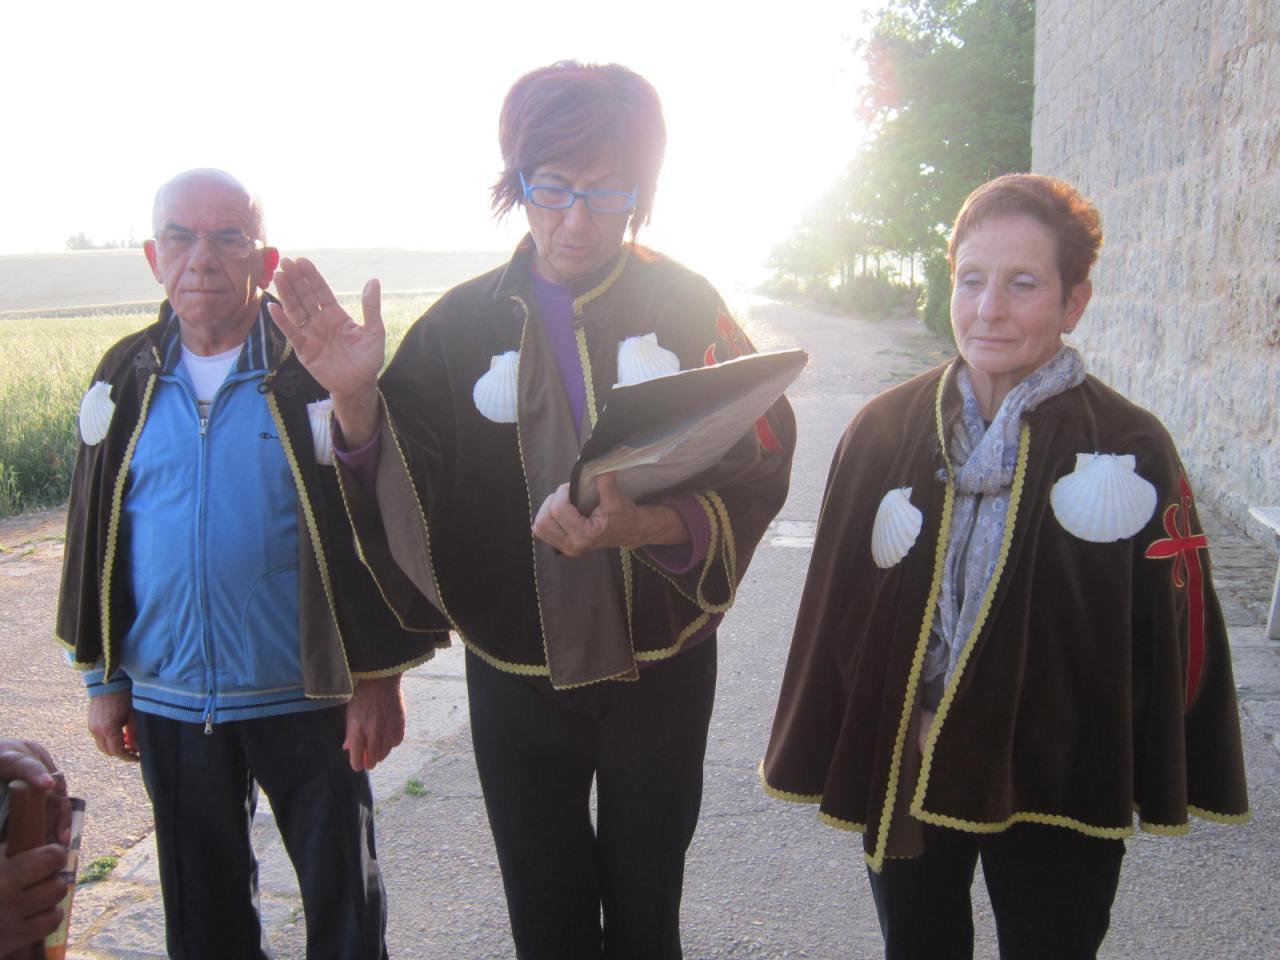 Morning prayers leaving the Ermita de San Nicolas on the Camino Frances/FrenchWay